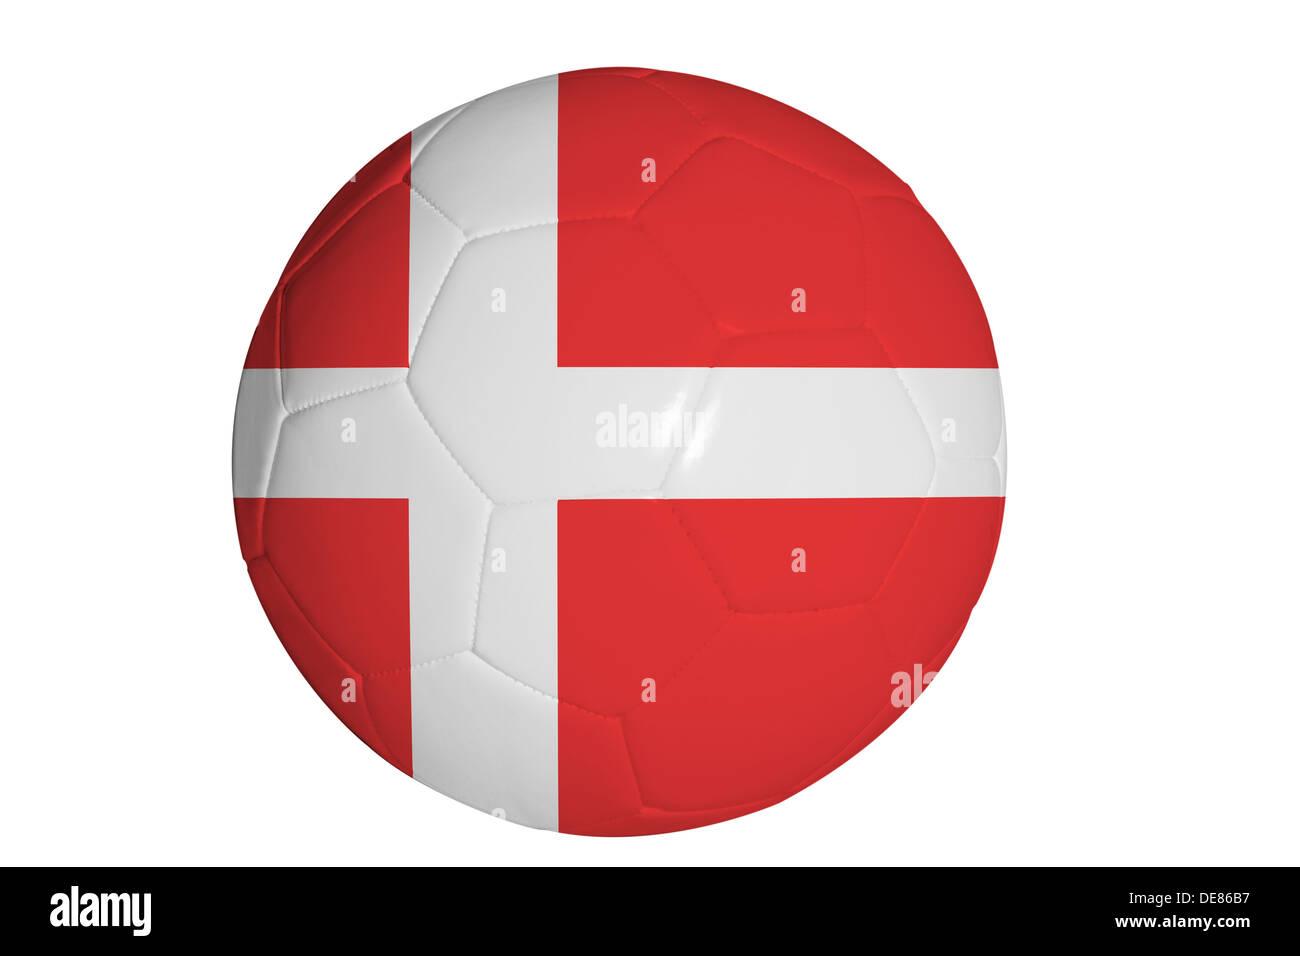 Danische Flagge Grafik Auf Fussball Stockfoto Bild 60416923